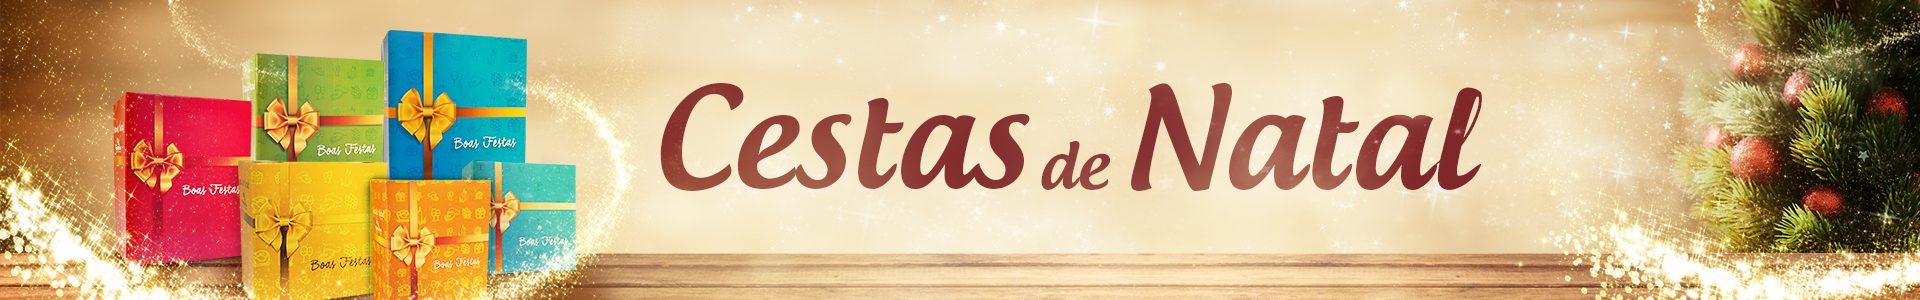 Cestas de Natal